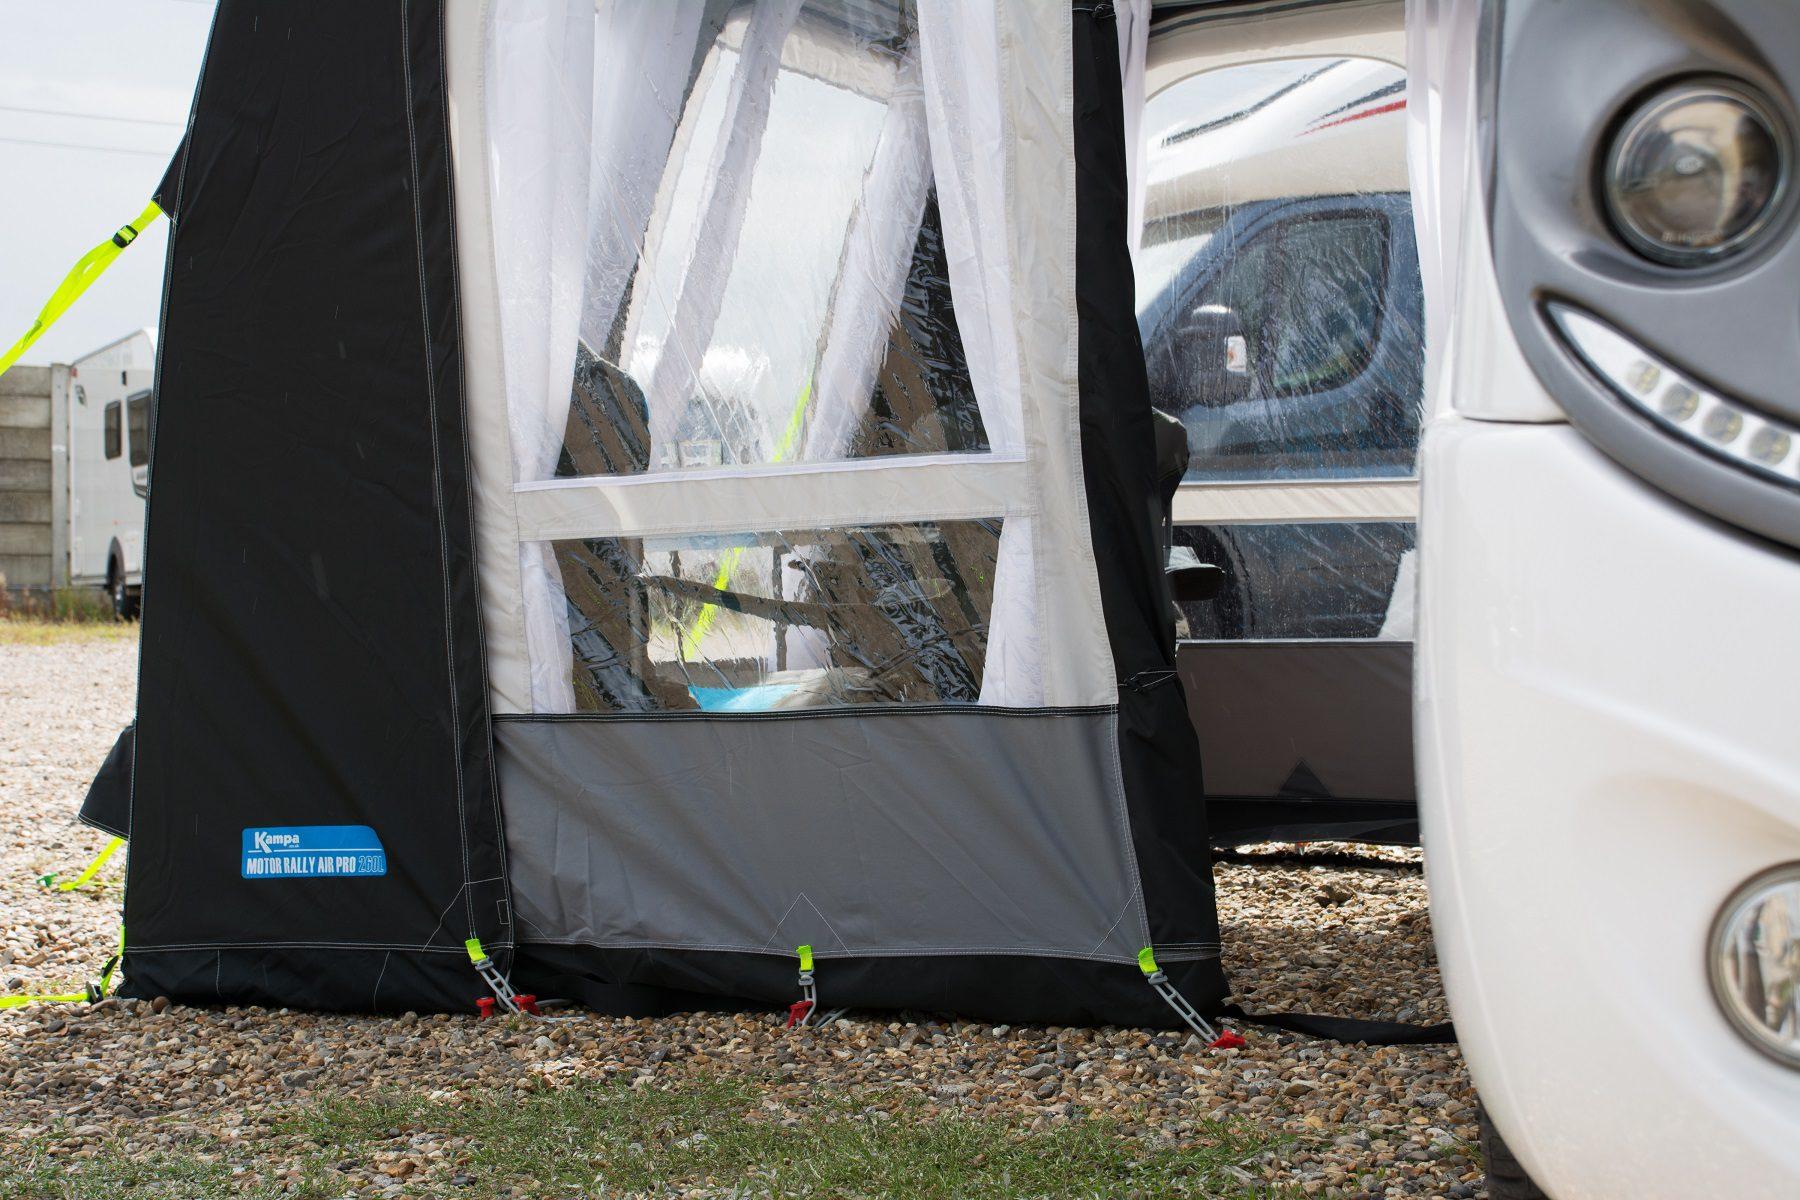 Kampa Motor Rally Air Pro 260 Xl Motor Home Awning 2018